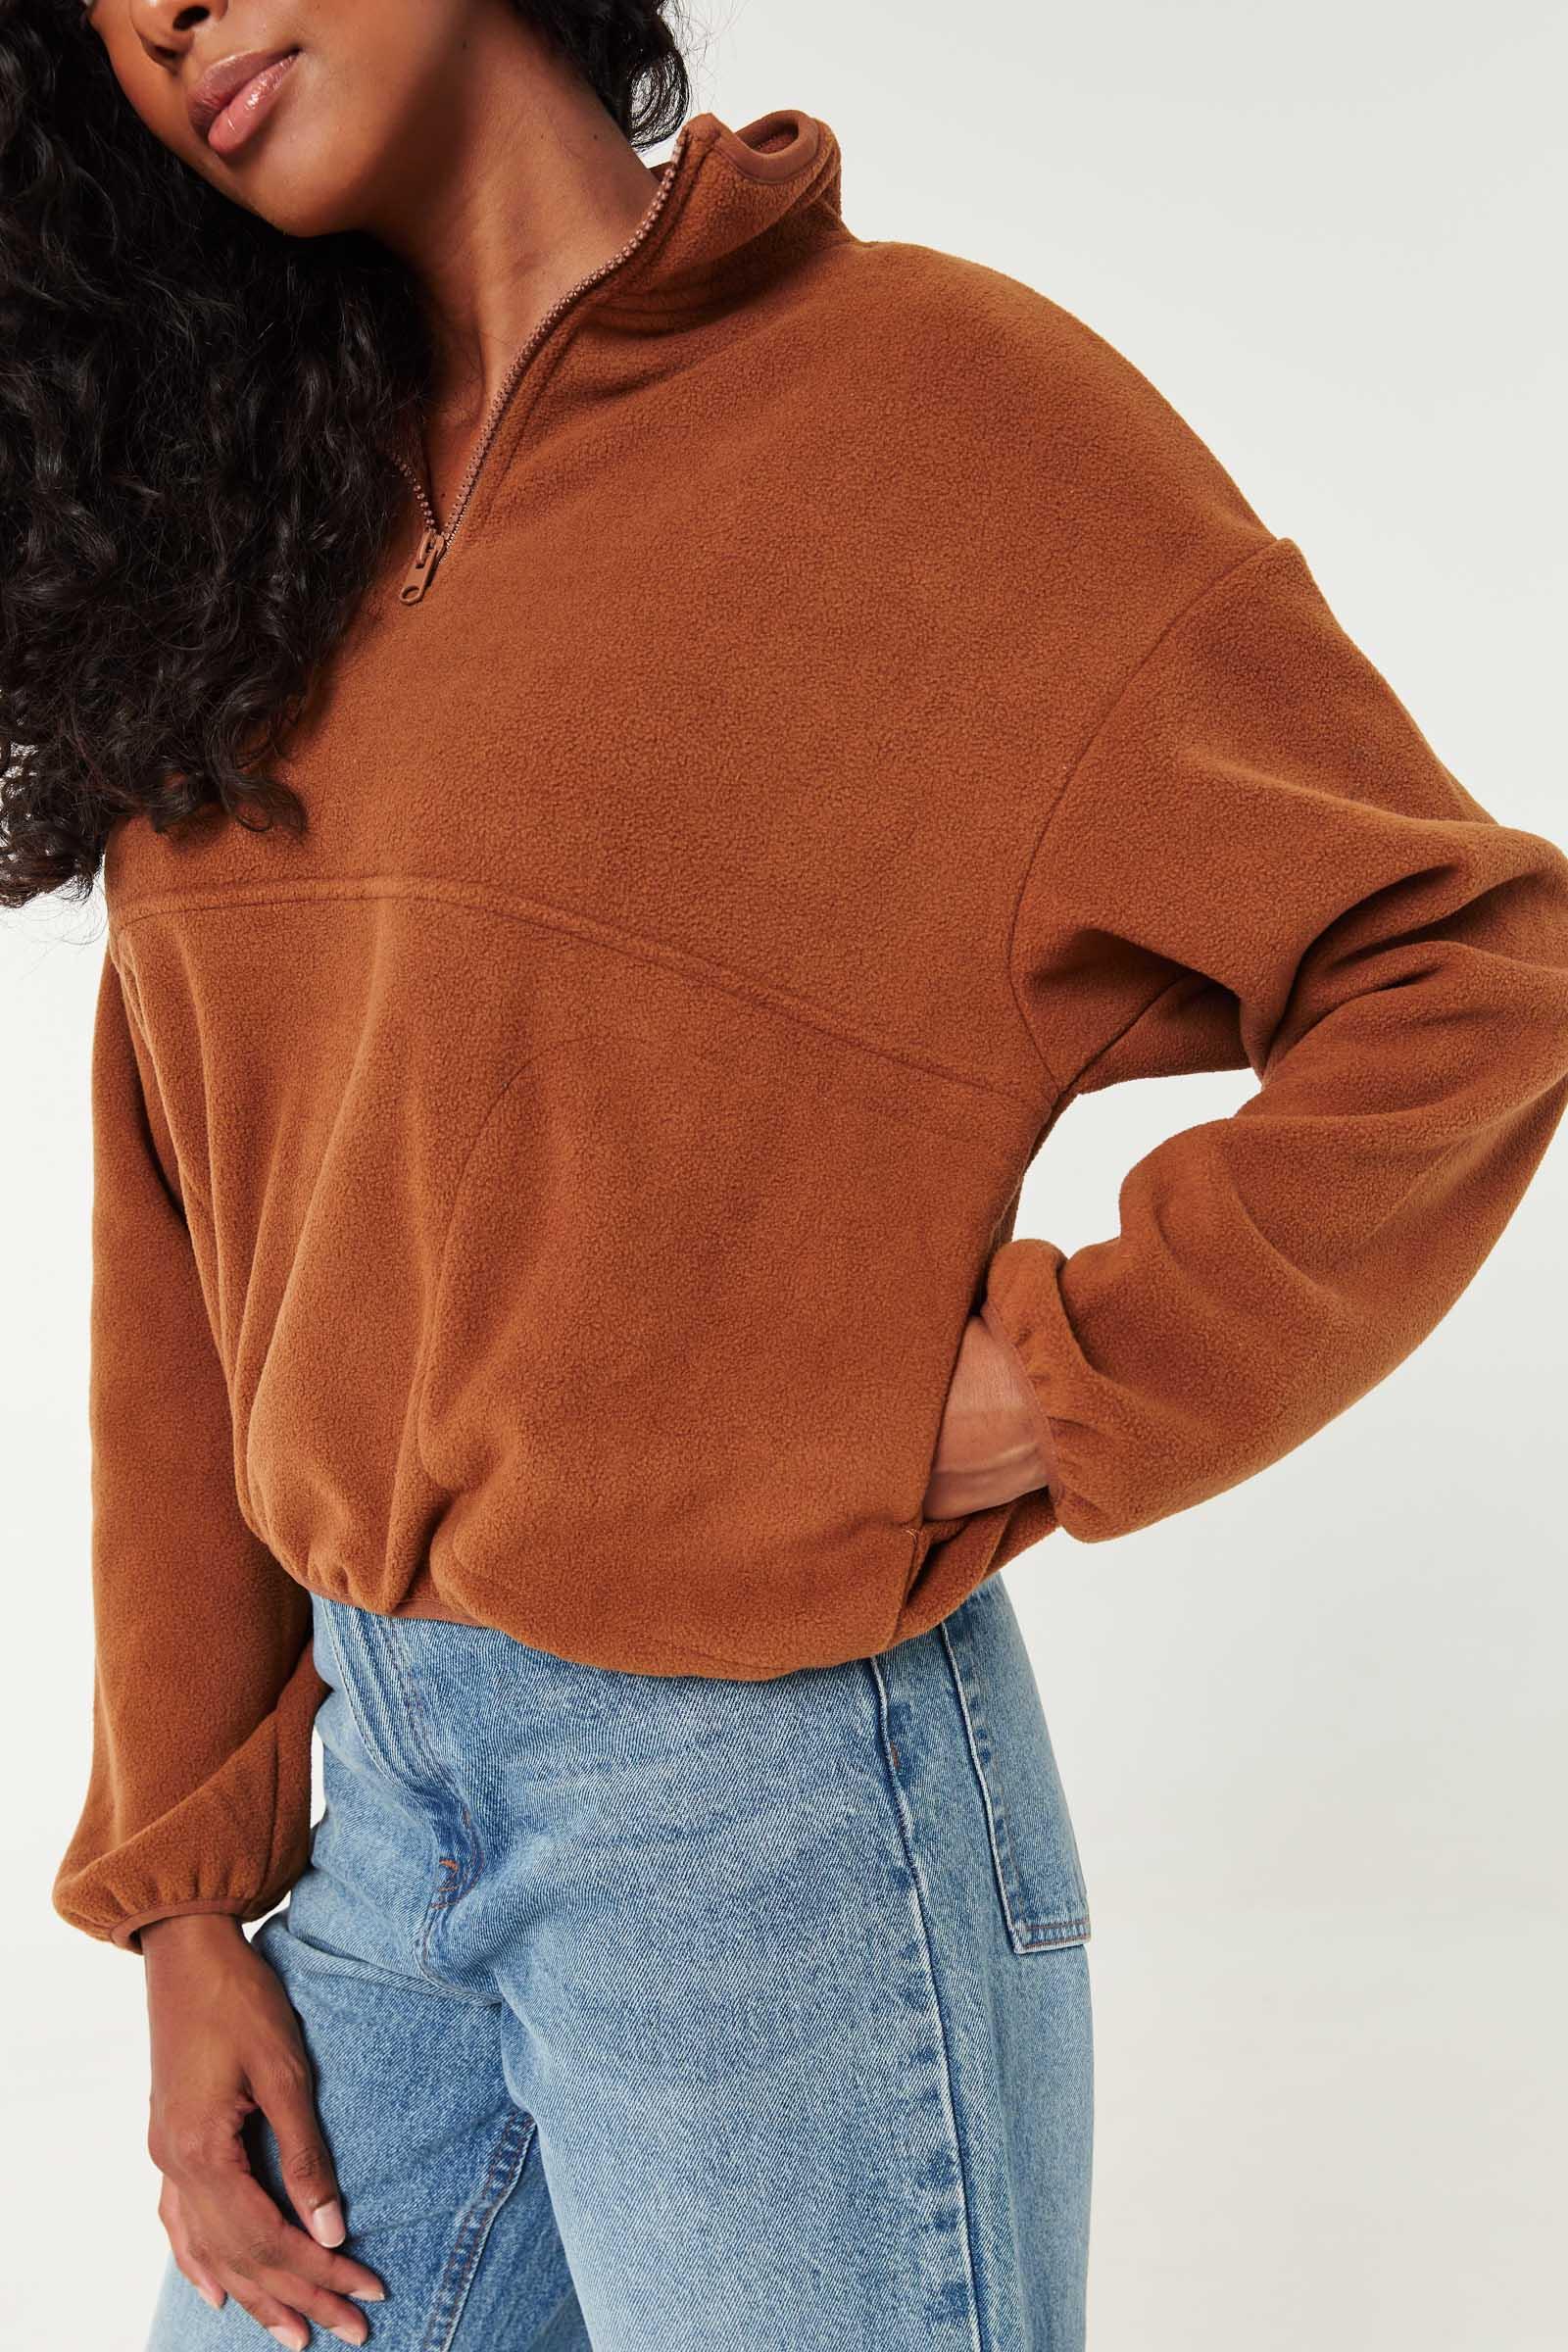 Zip Mock Fleece Sweatshirt